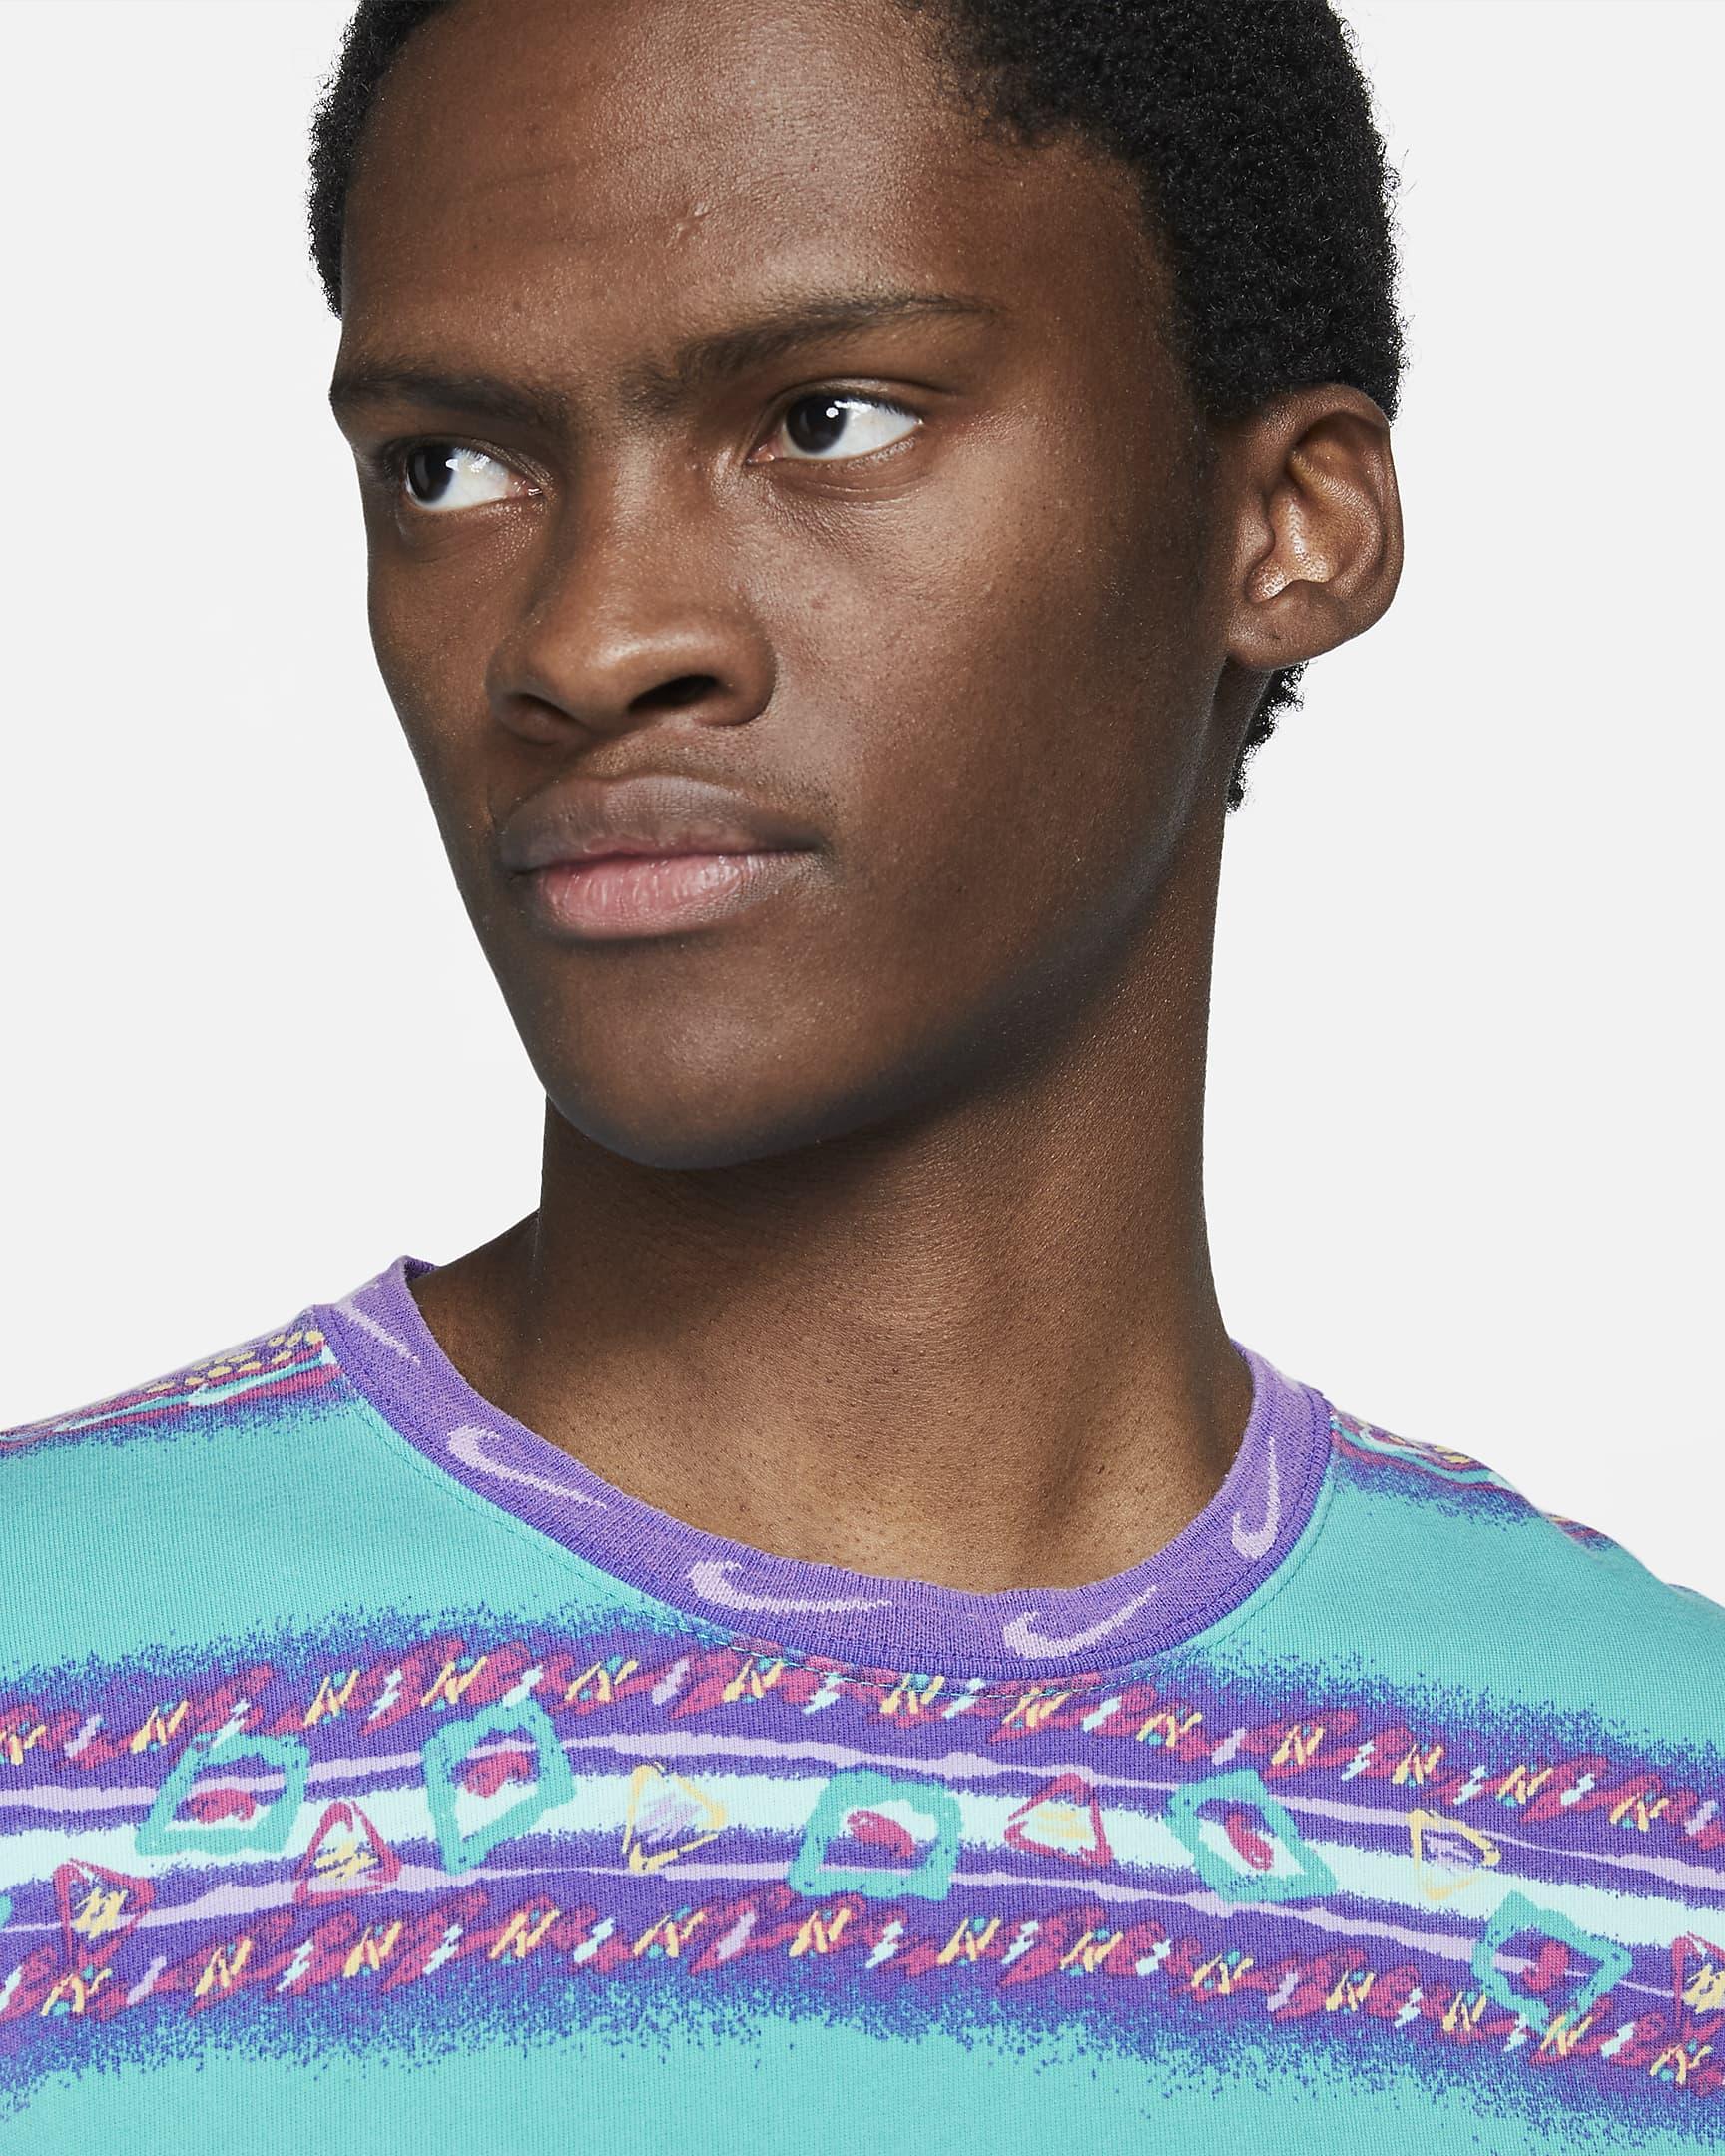 nike-sportswear-stories-mens-max-90-t-shirt-7vVnv1-2.png